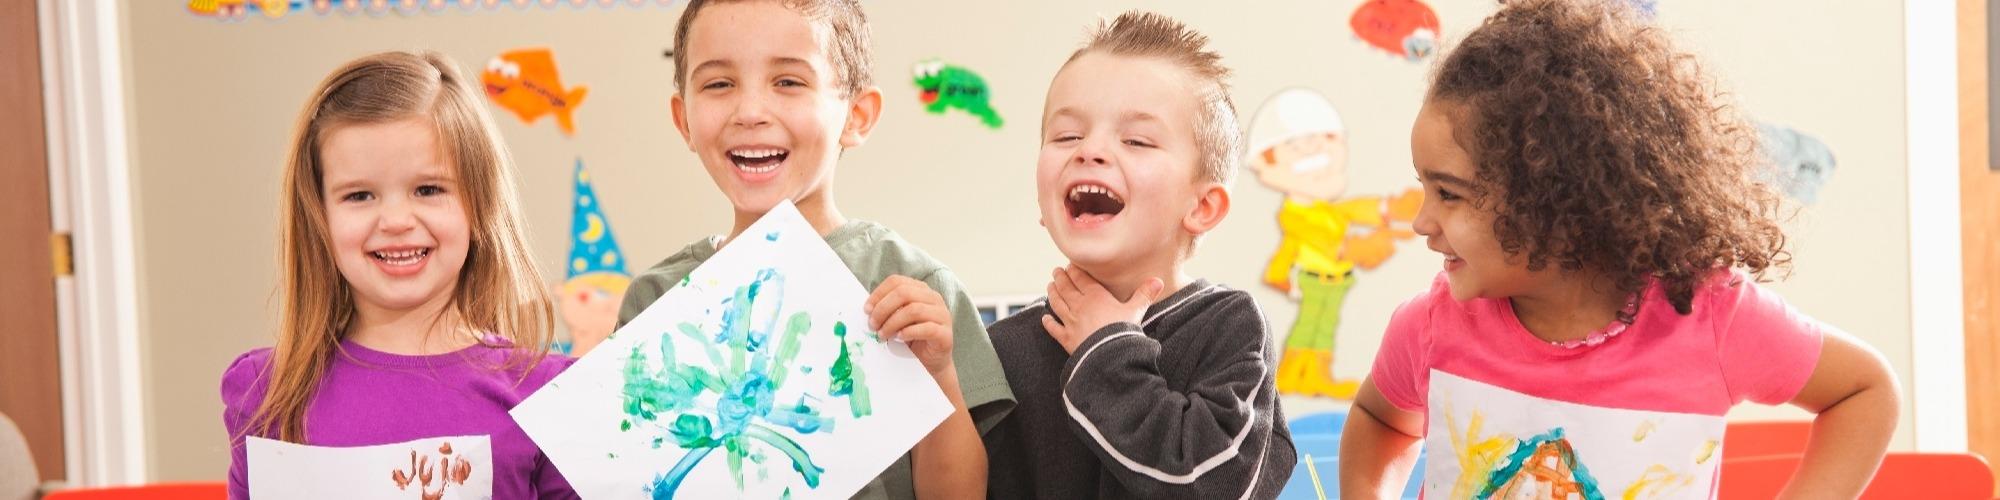 New Covenant Church Preschool Programs